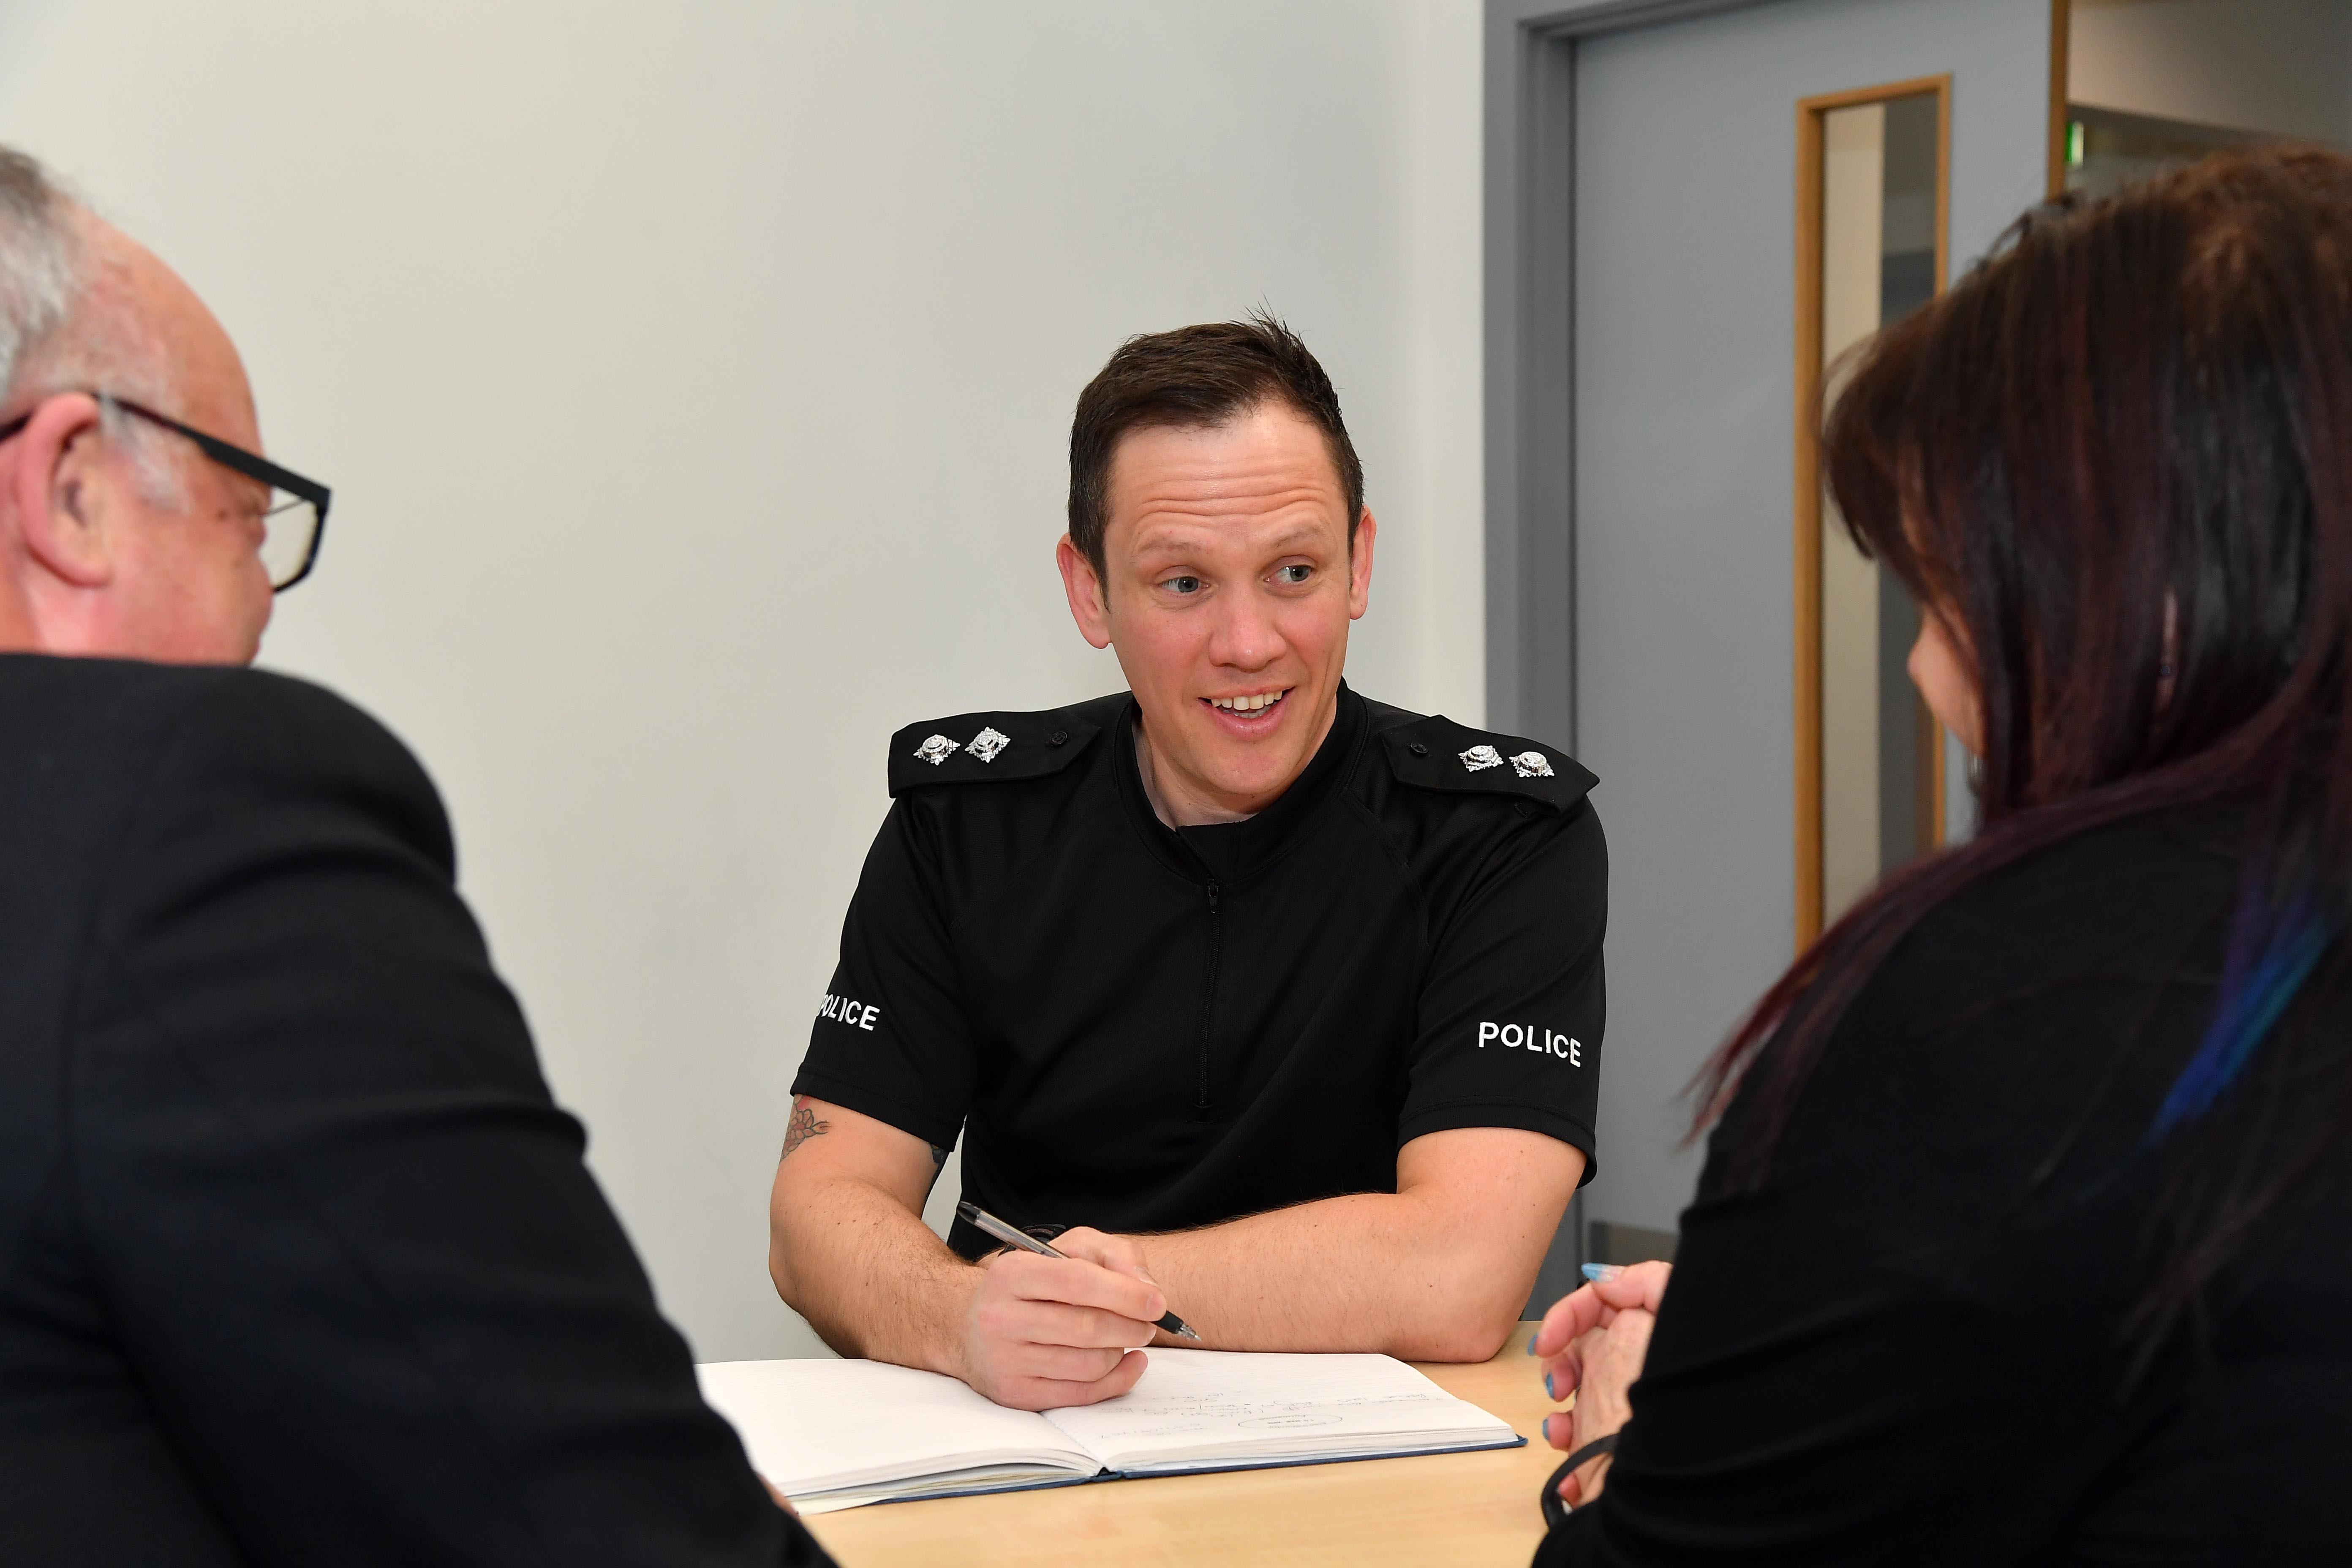 Inspector Andy Scott